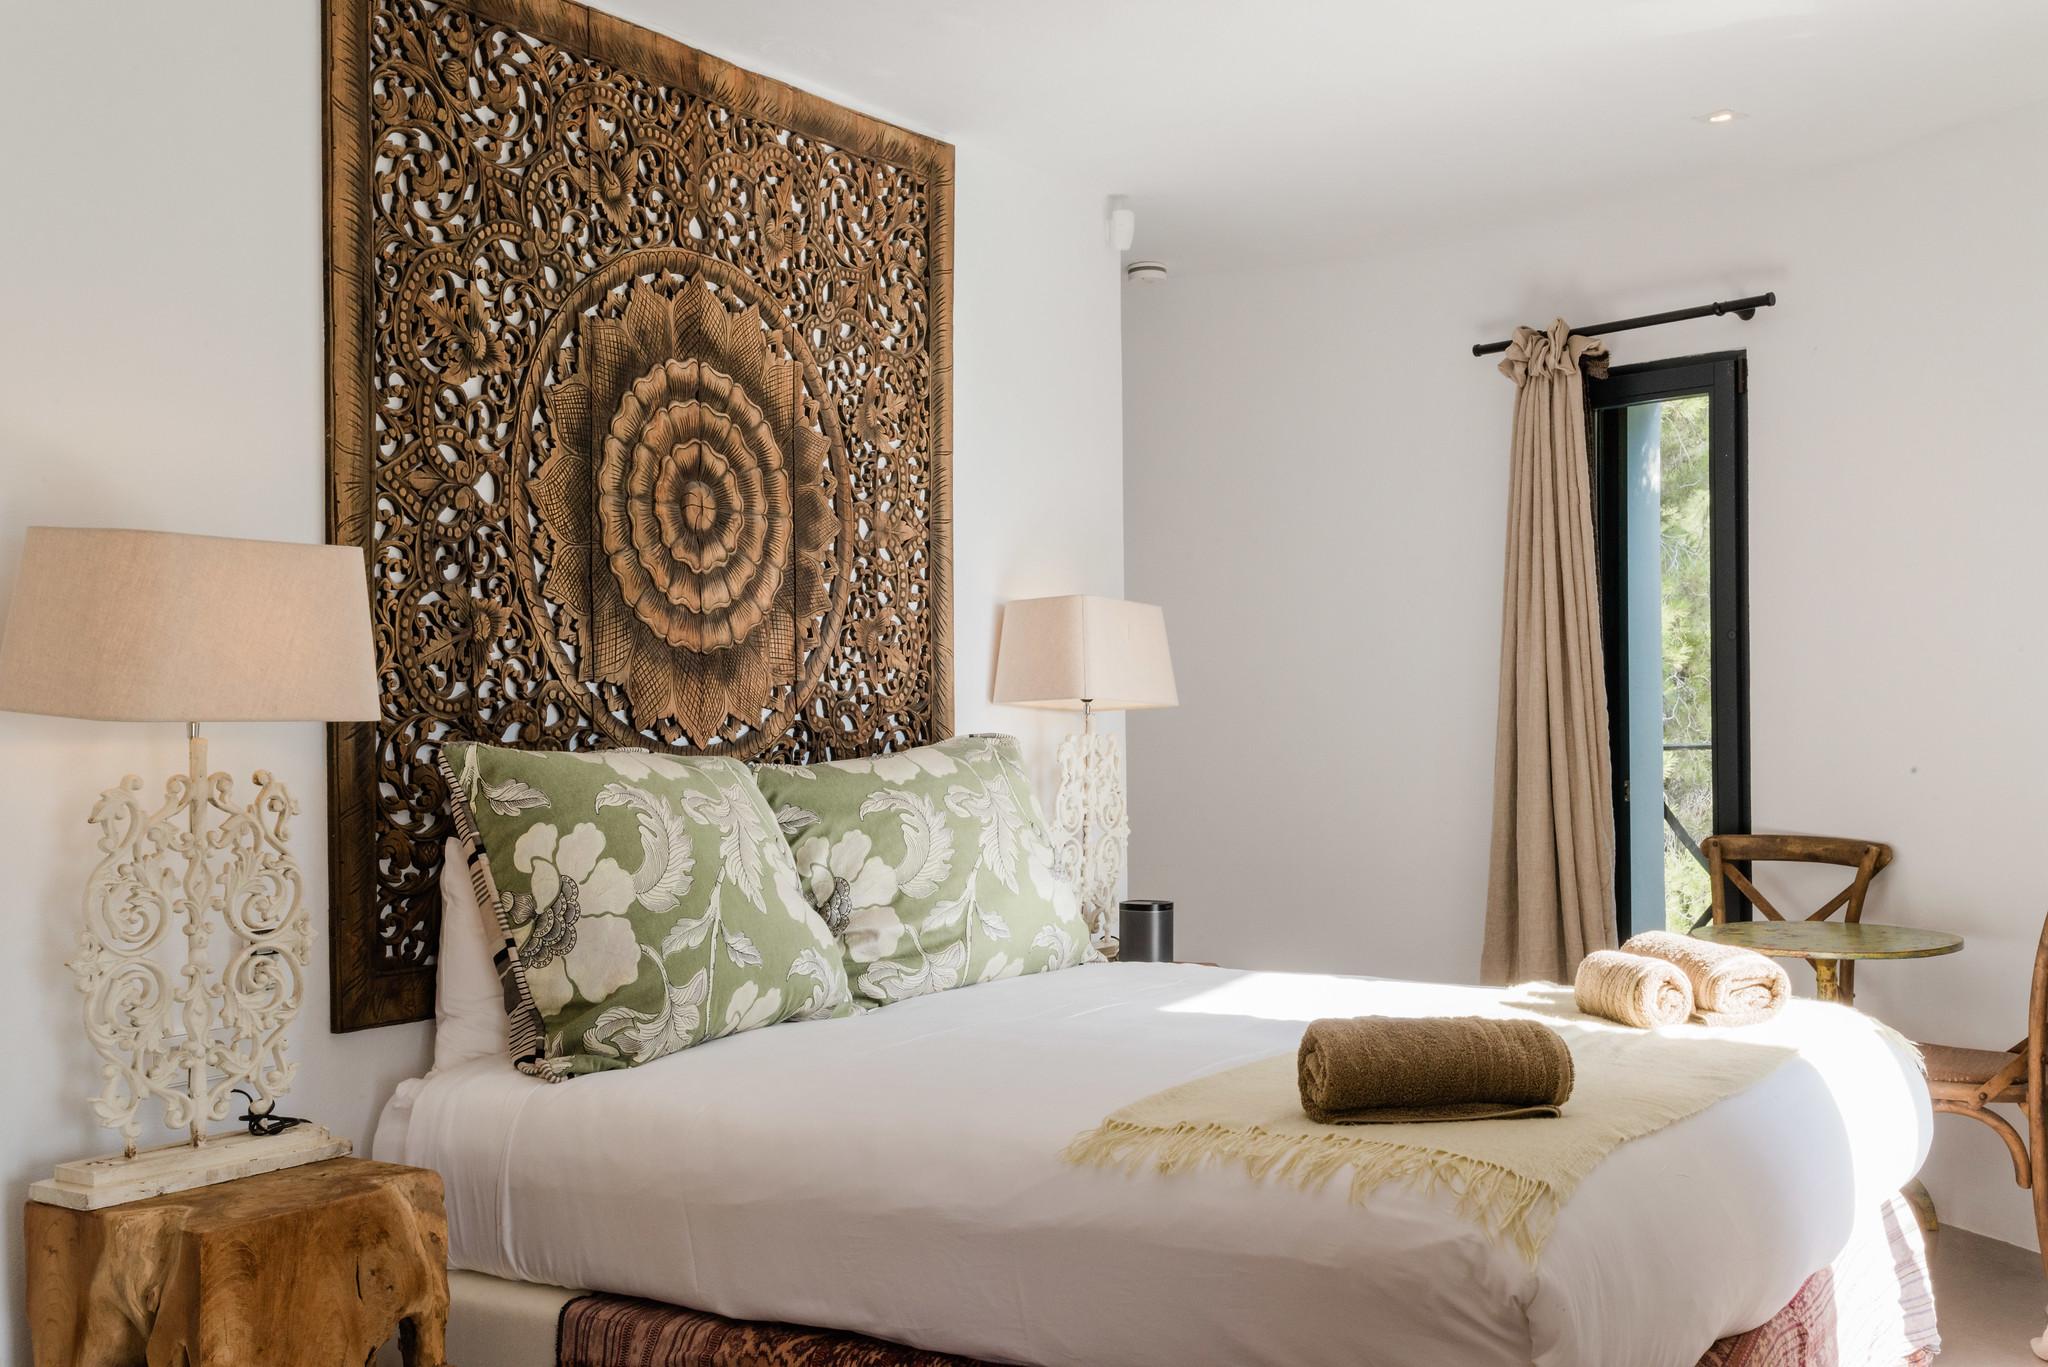 https://www.white-ibiza.com/wp-content/uploads/2020/05/white-ibiza-villas-casa-amalia-interior-bedroom3.jpg